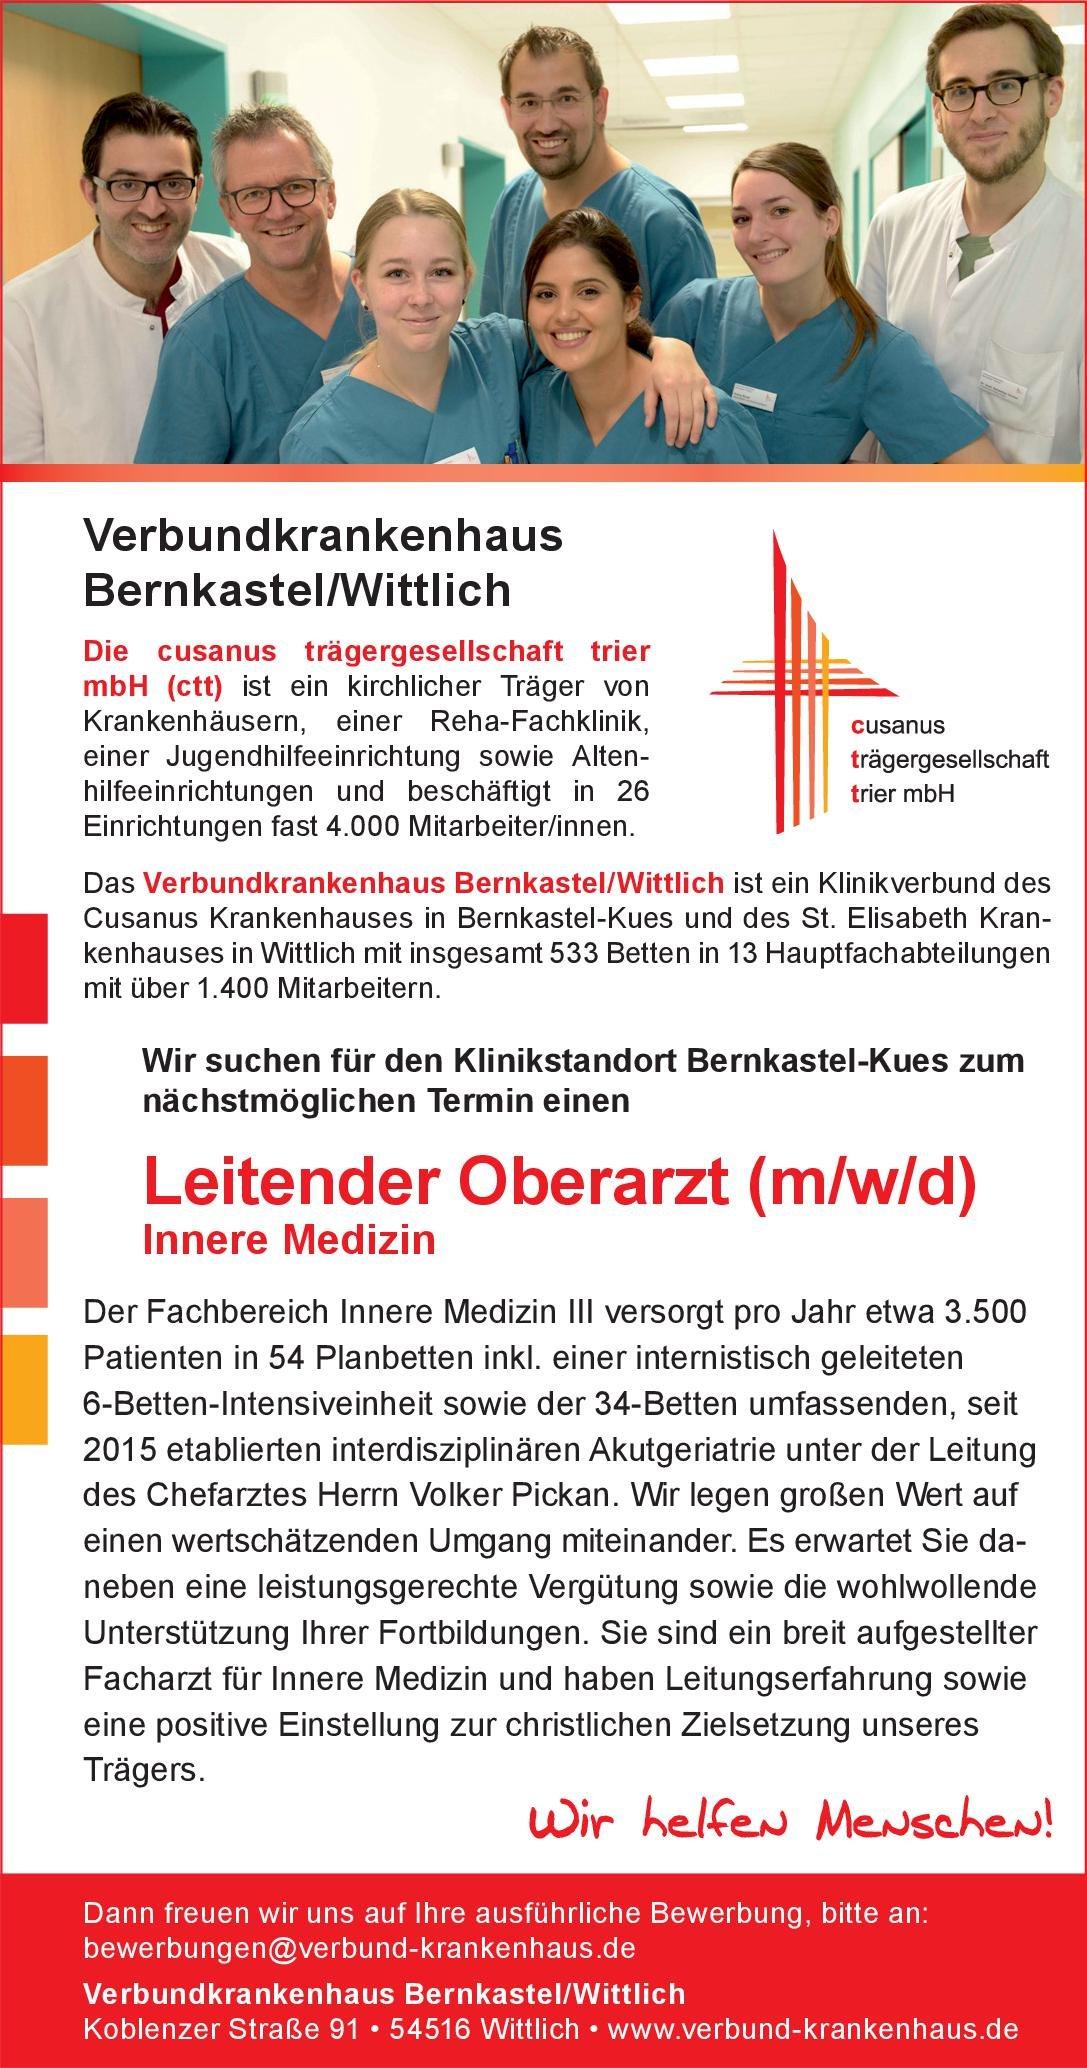 Verbundkrankenhaus Bernkastel/Wittlich Leitender Oberarzt (m/w/d) Innere Medizin  Innere Medizin, Innere Medizin Oberarzt